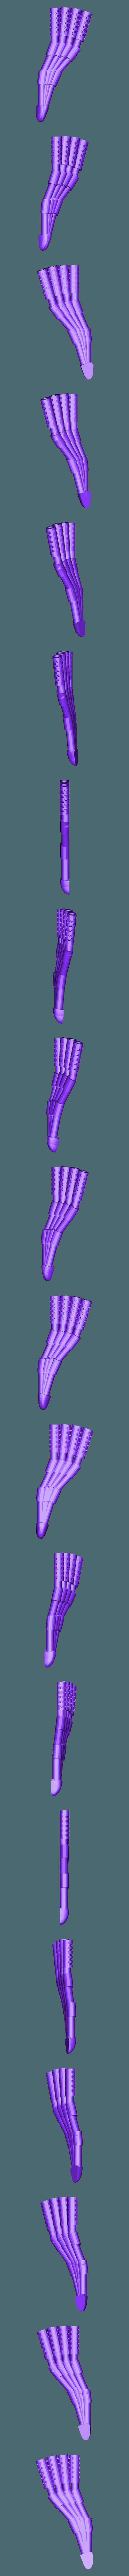 Quad_Long_Side_R.stl Download free STL file Gaslands Greebles (Blowers and Burners) • Design to 3D print, Ellie_Valkyrie